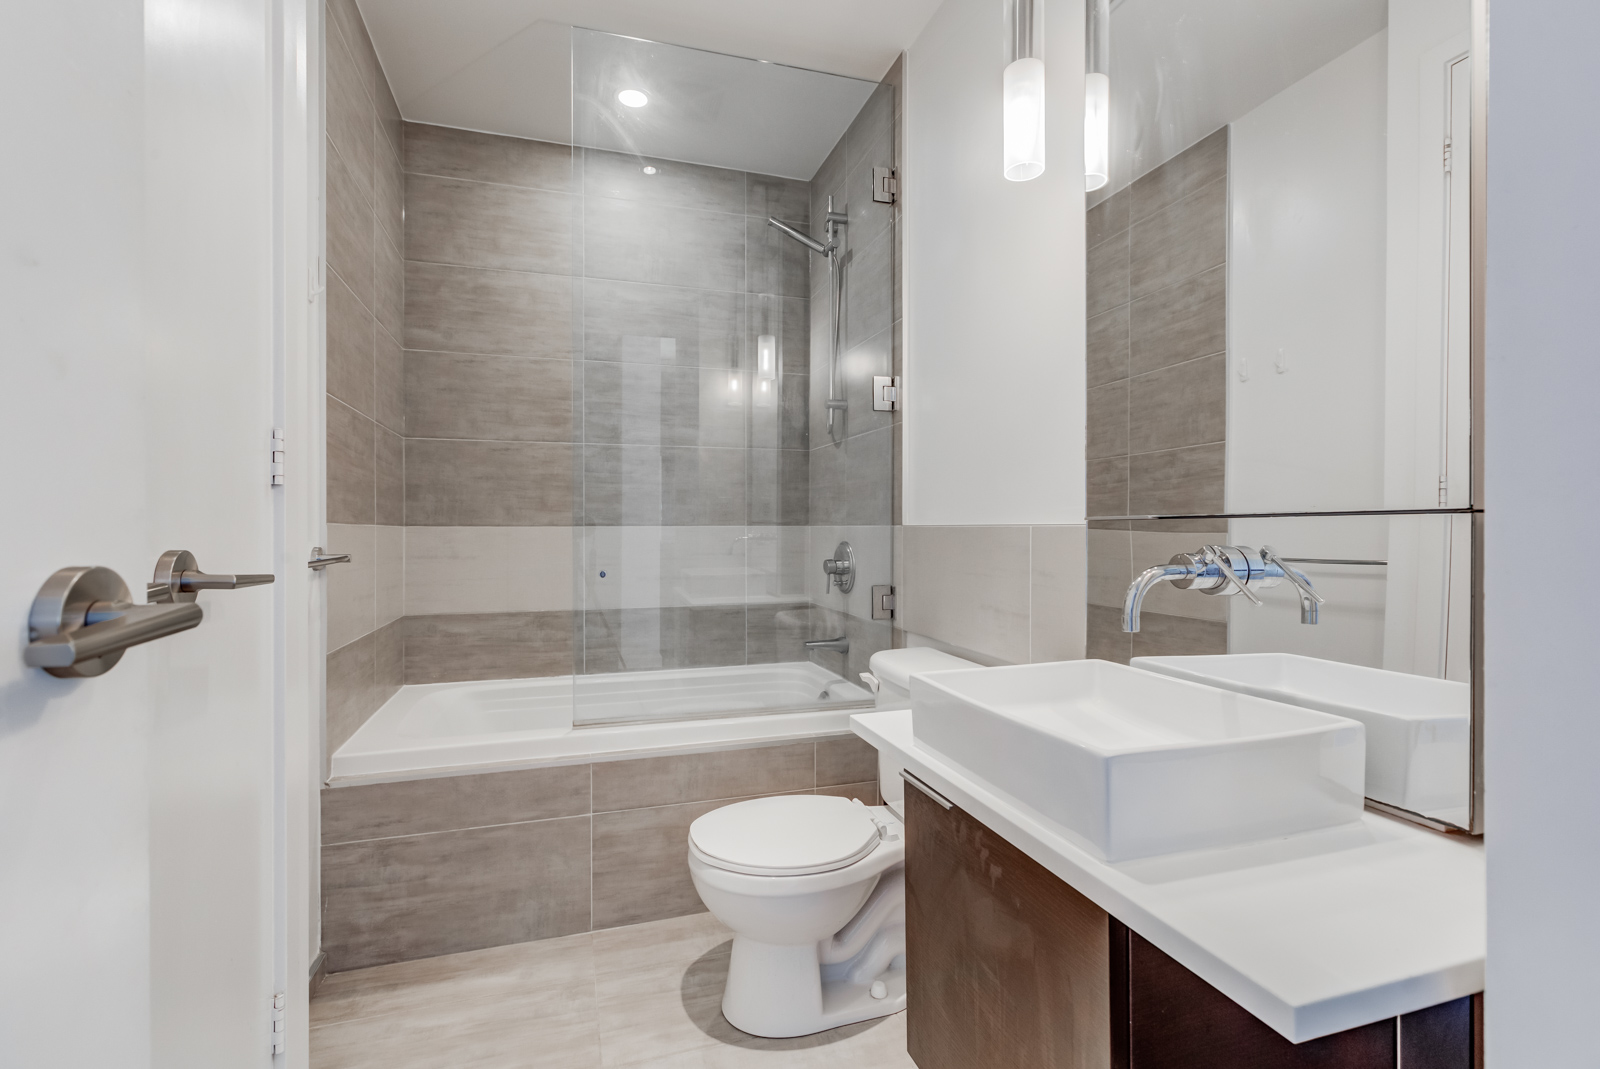 Master bathroom with modern bathtub, raised sink basin, tall mirror, detachable showerhead and brown colours.